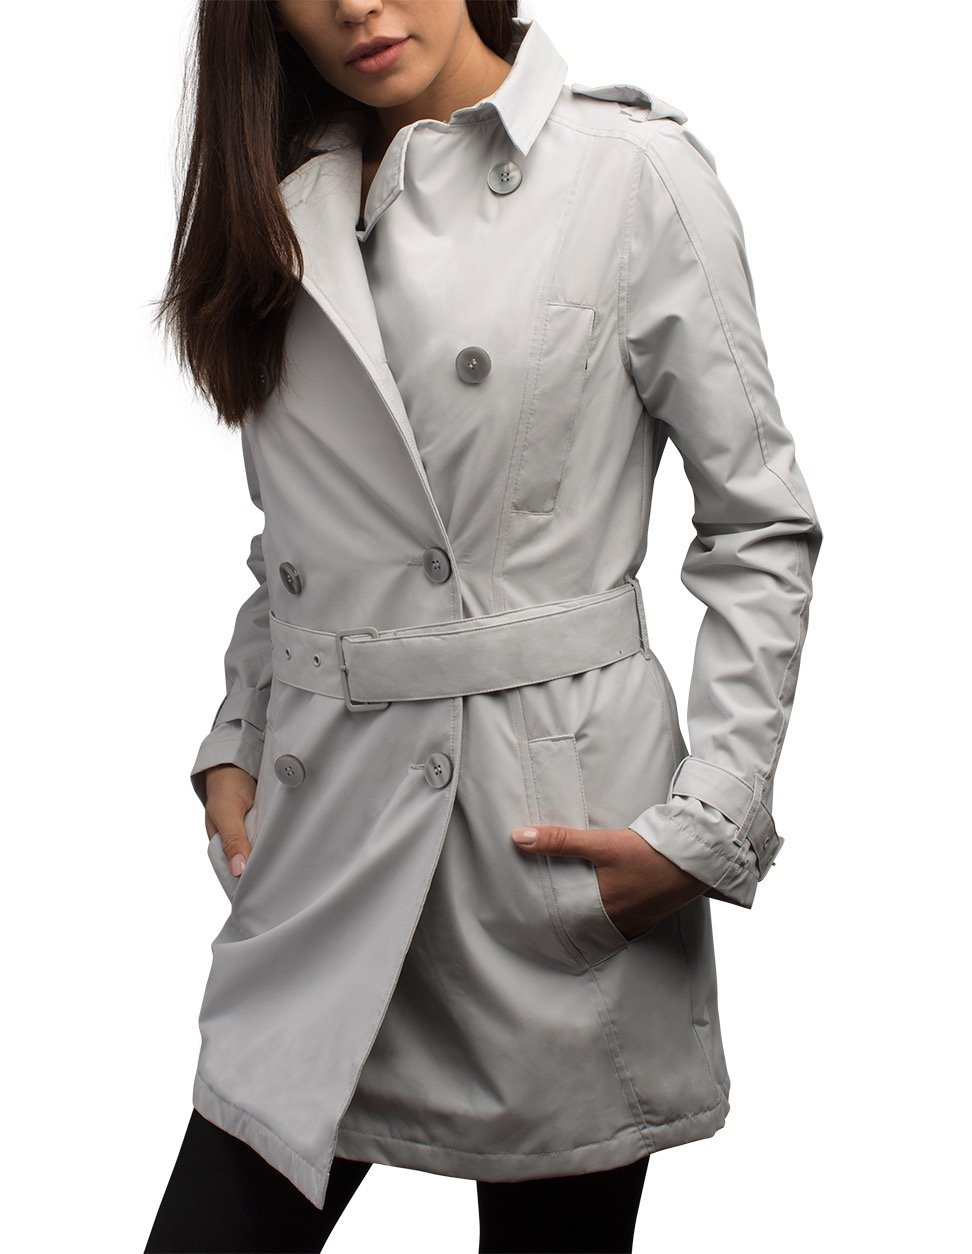 SCOTTeVEST Women's Trench Coat - 18 Pockets - Travel Clothing MST XL